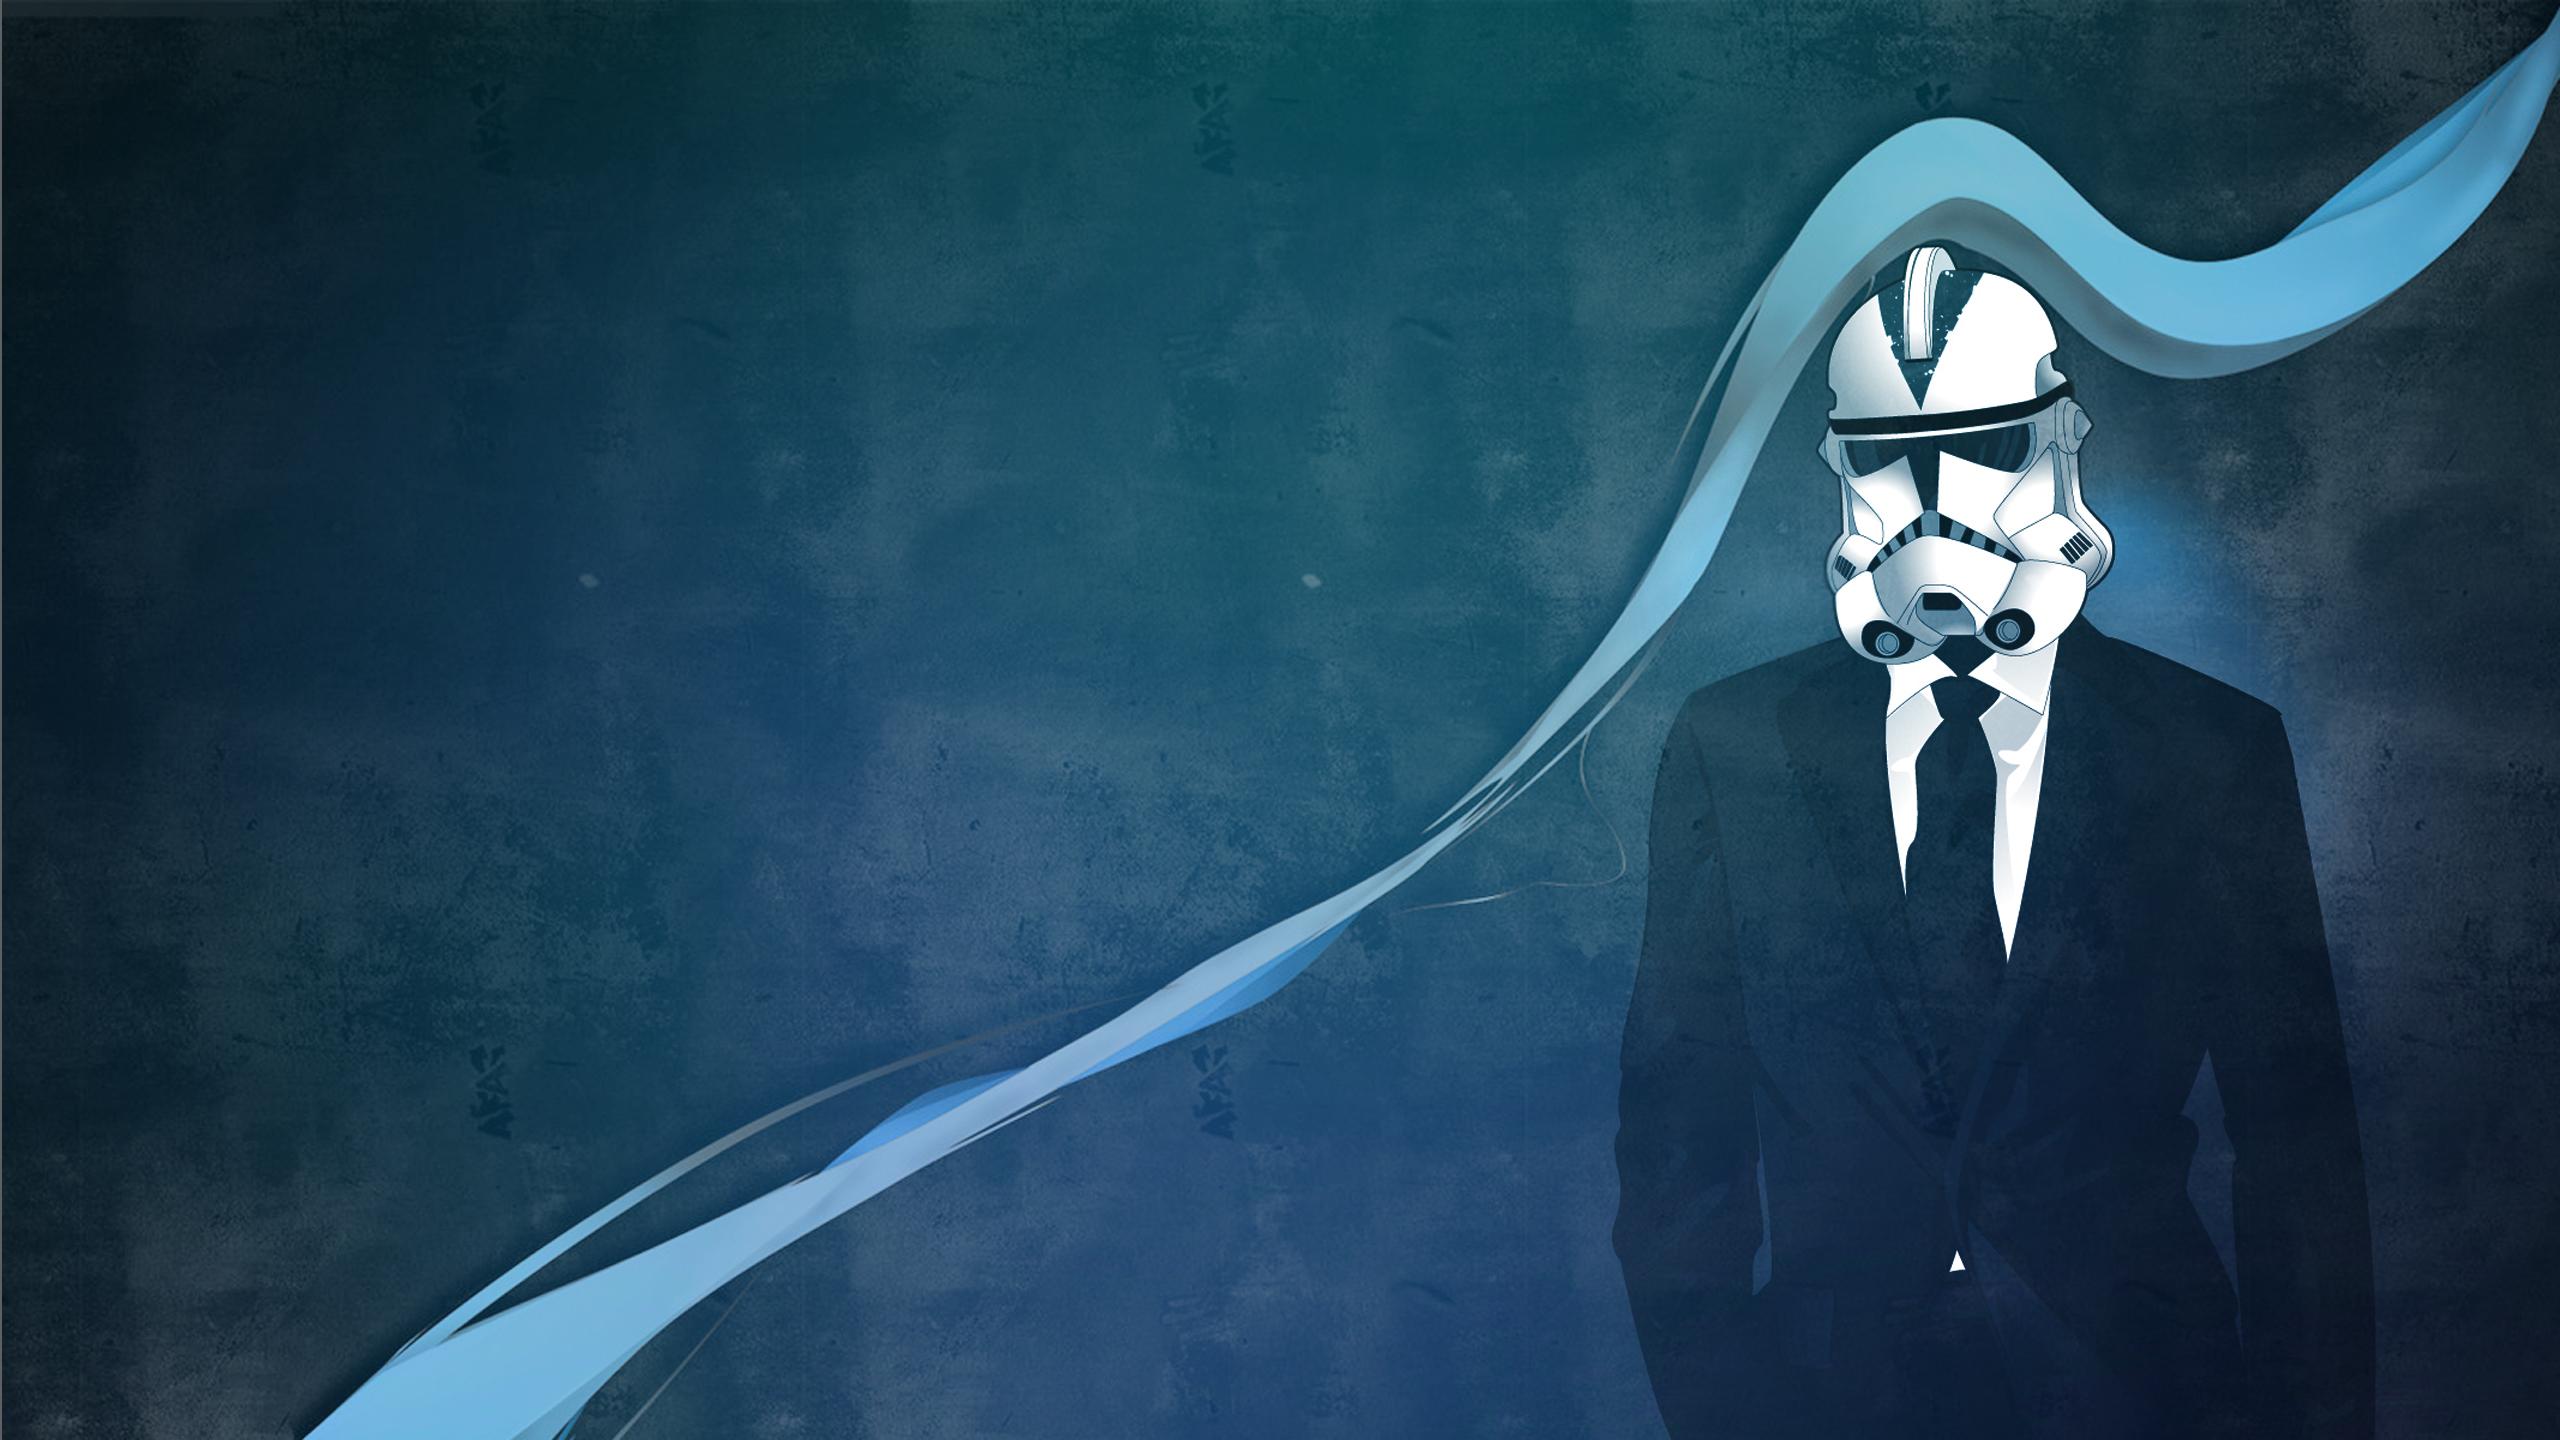 Darth Vader Death Star Funny Minimalistic Star Wars 2560x1440